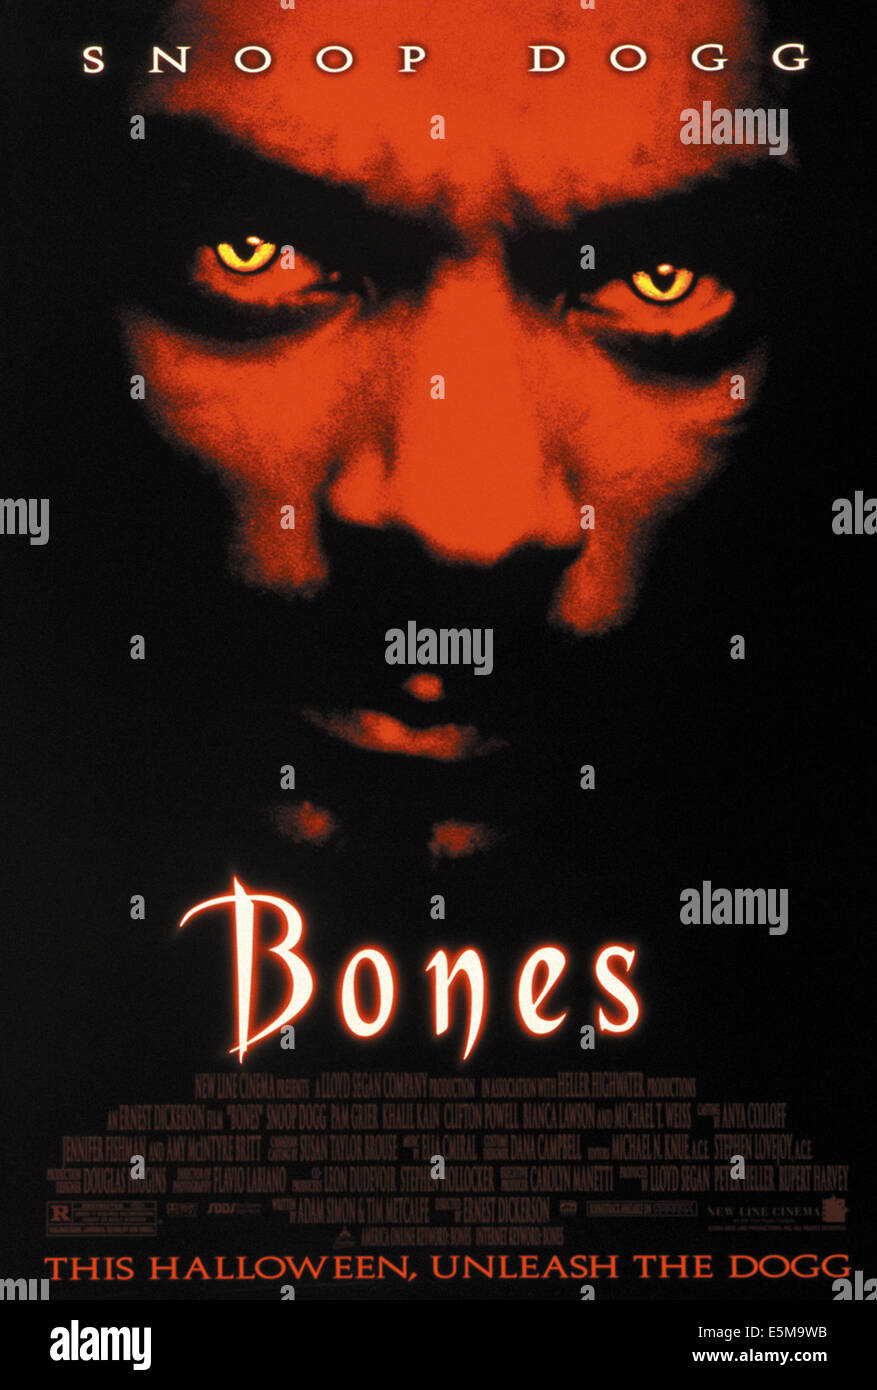 BONES, Snoop Dogg, poster art, 2001, ©New Line Cinema/courtesy Everett Collection - Stock Image